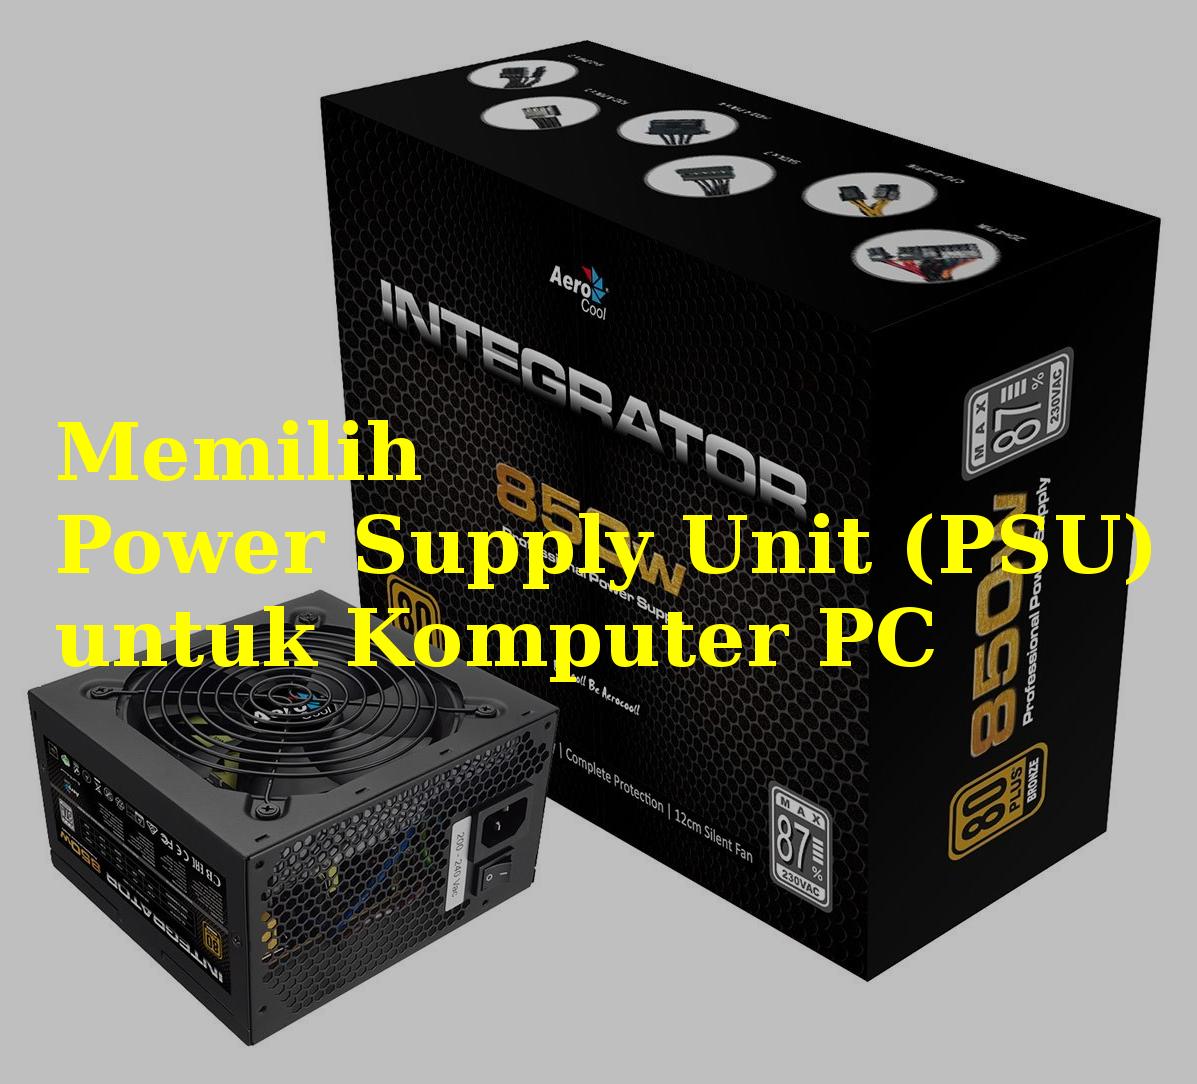 Tips Cara Memilih Power Supply Unit Psu Untuk Komputer Pc Kabel Sebagai Salah Satu Komponen Penting Dalam Merakit Sebuah Tentu Saja Perlu Diketahui Bagaimana Dan